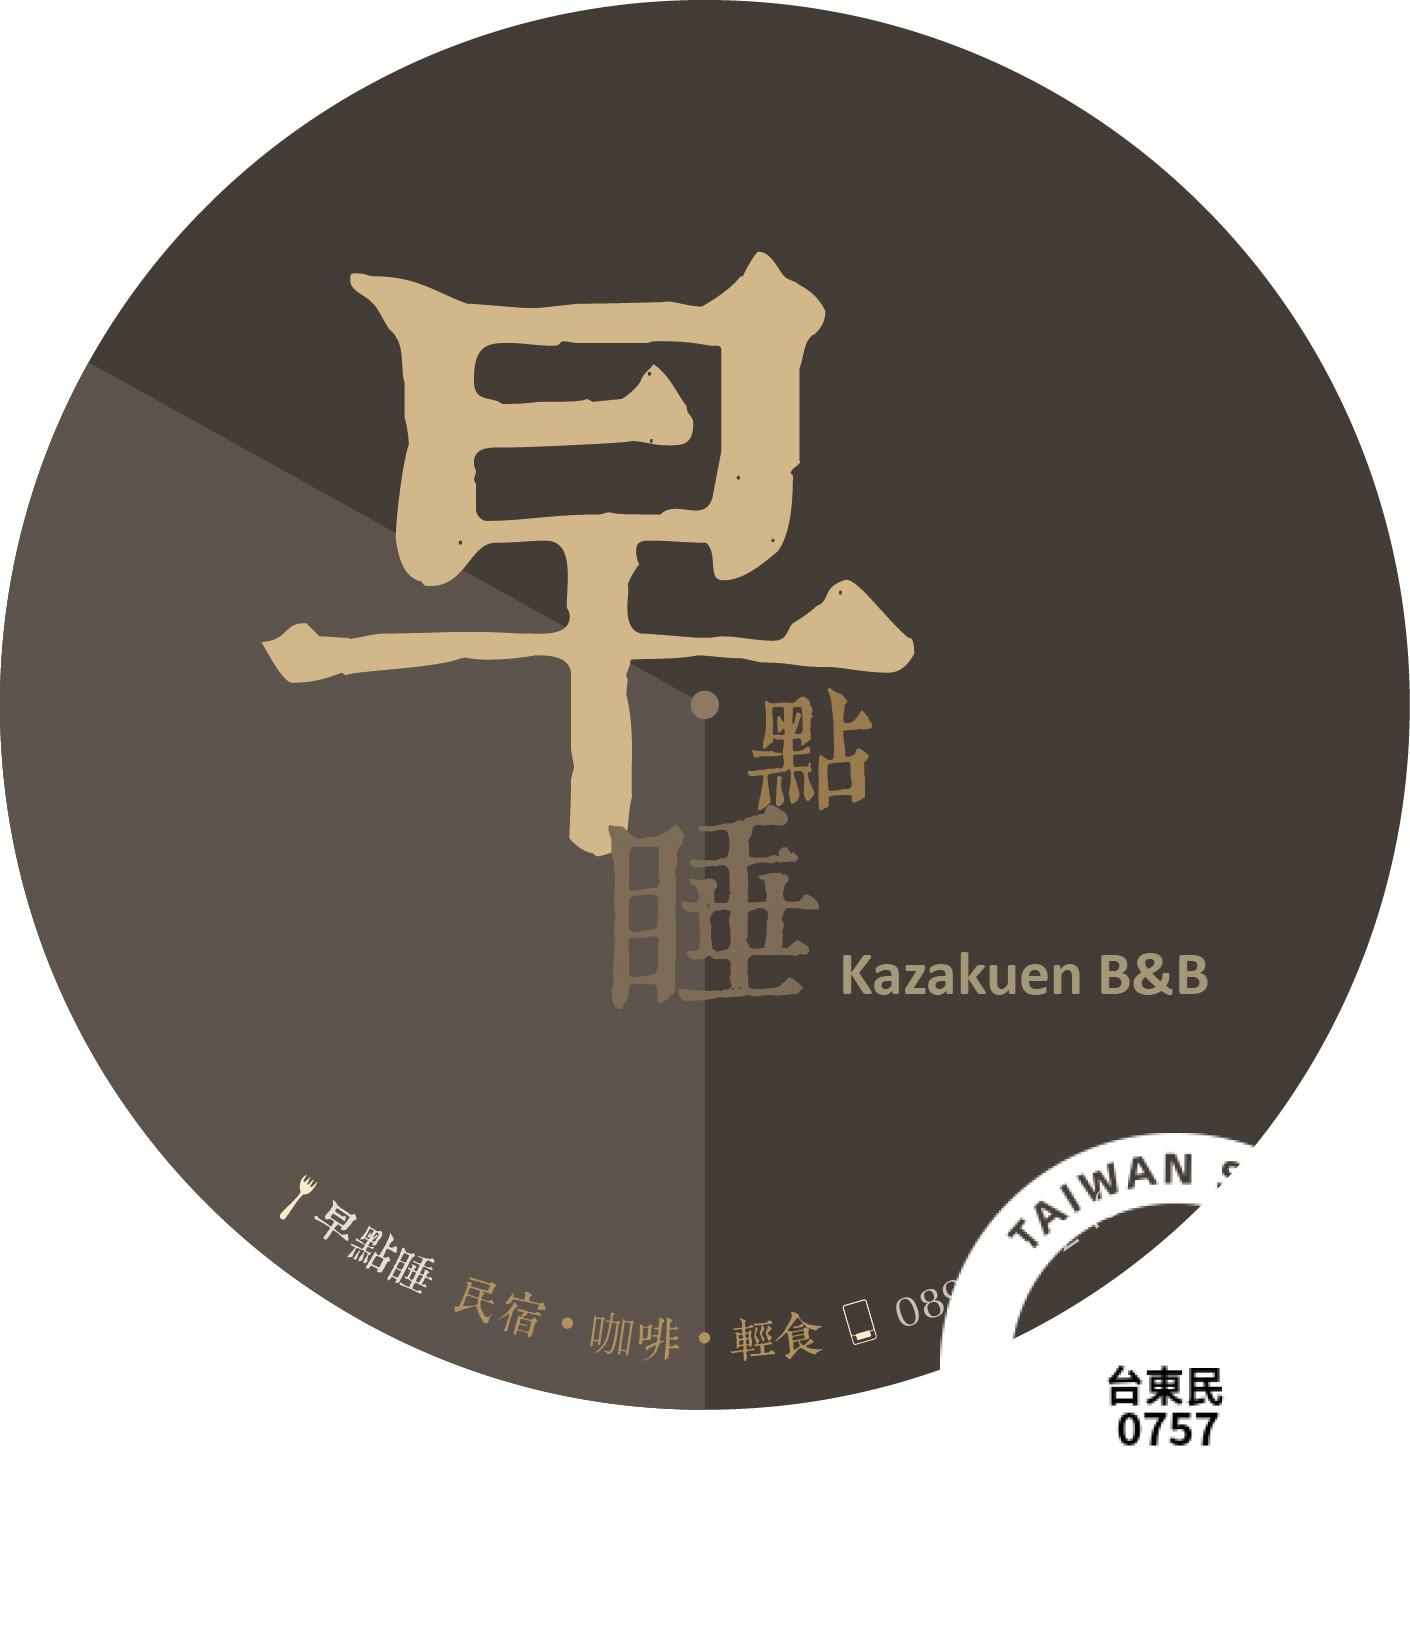 Kazakuen B&B